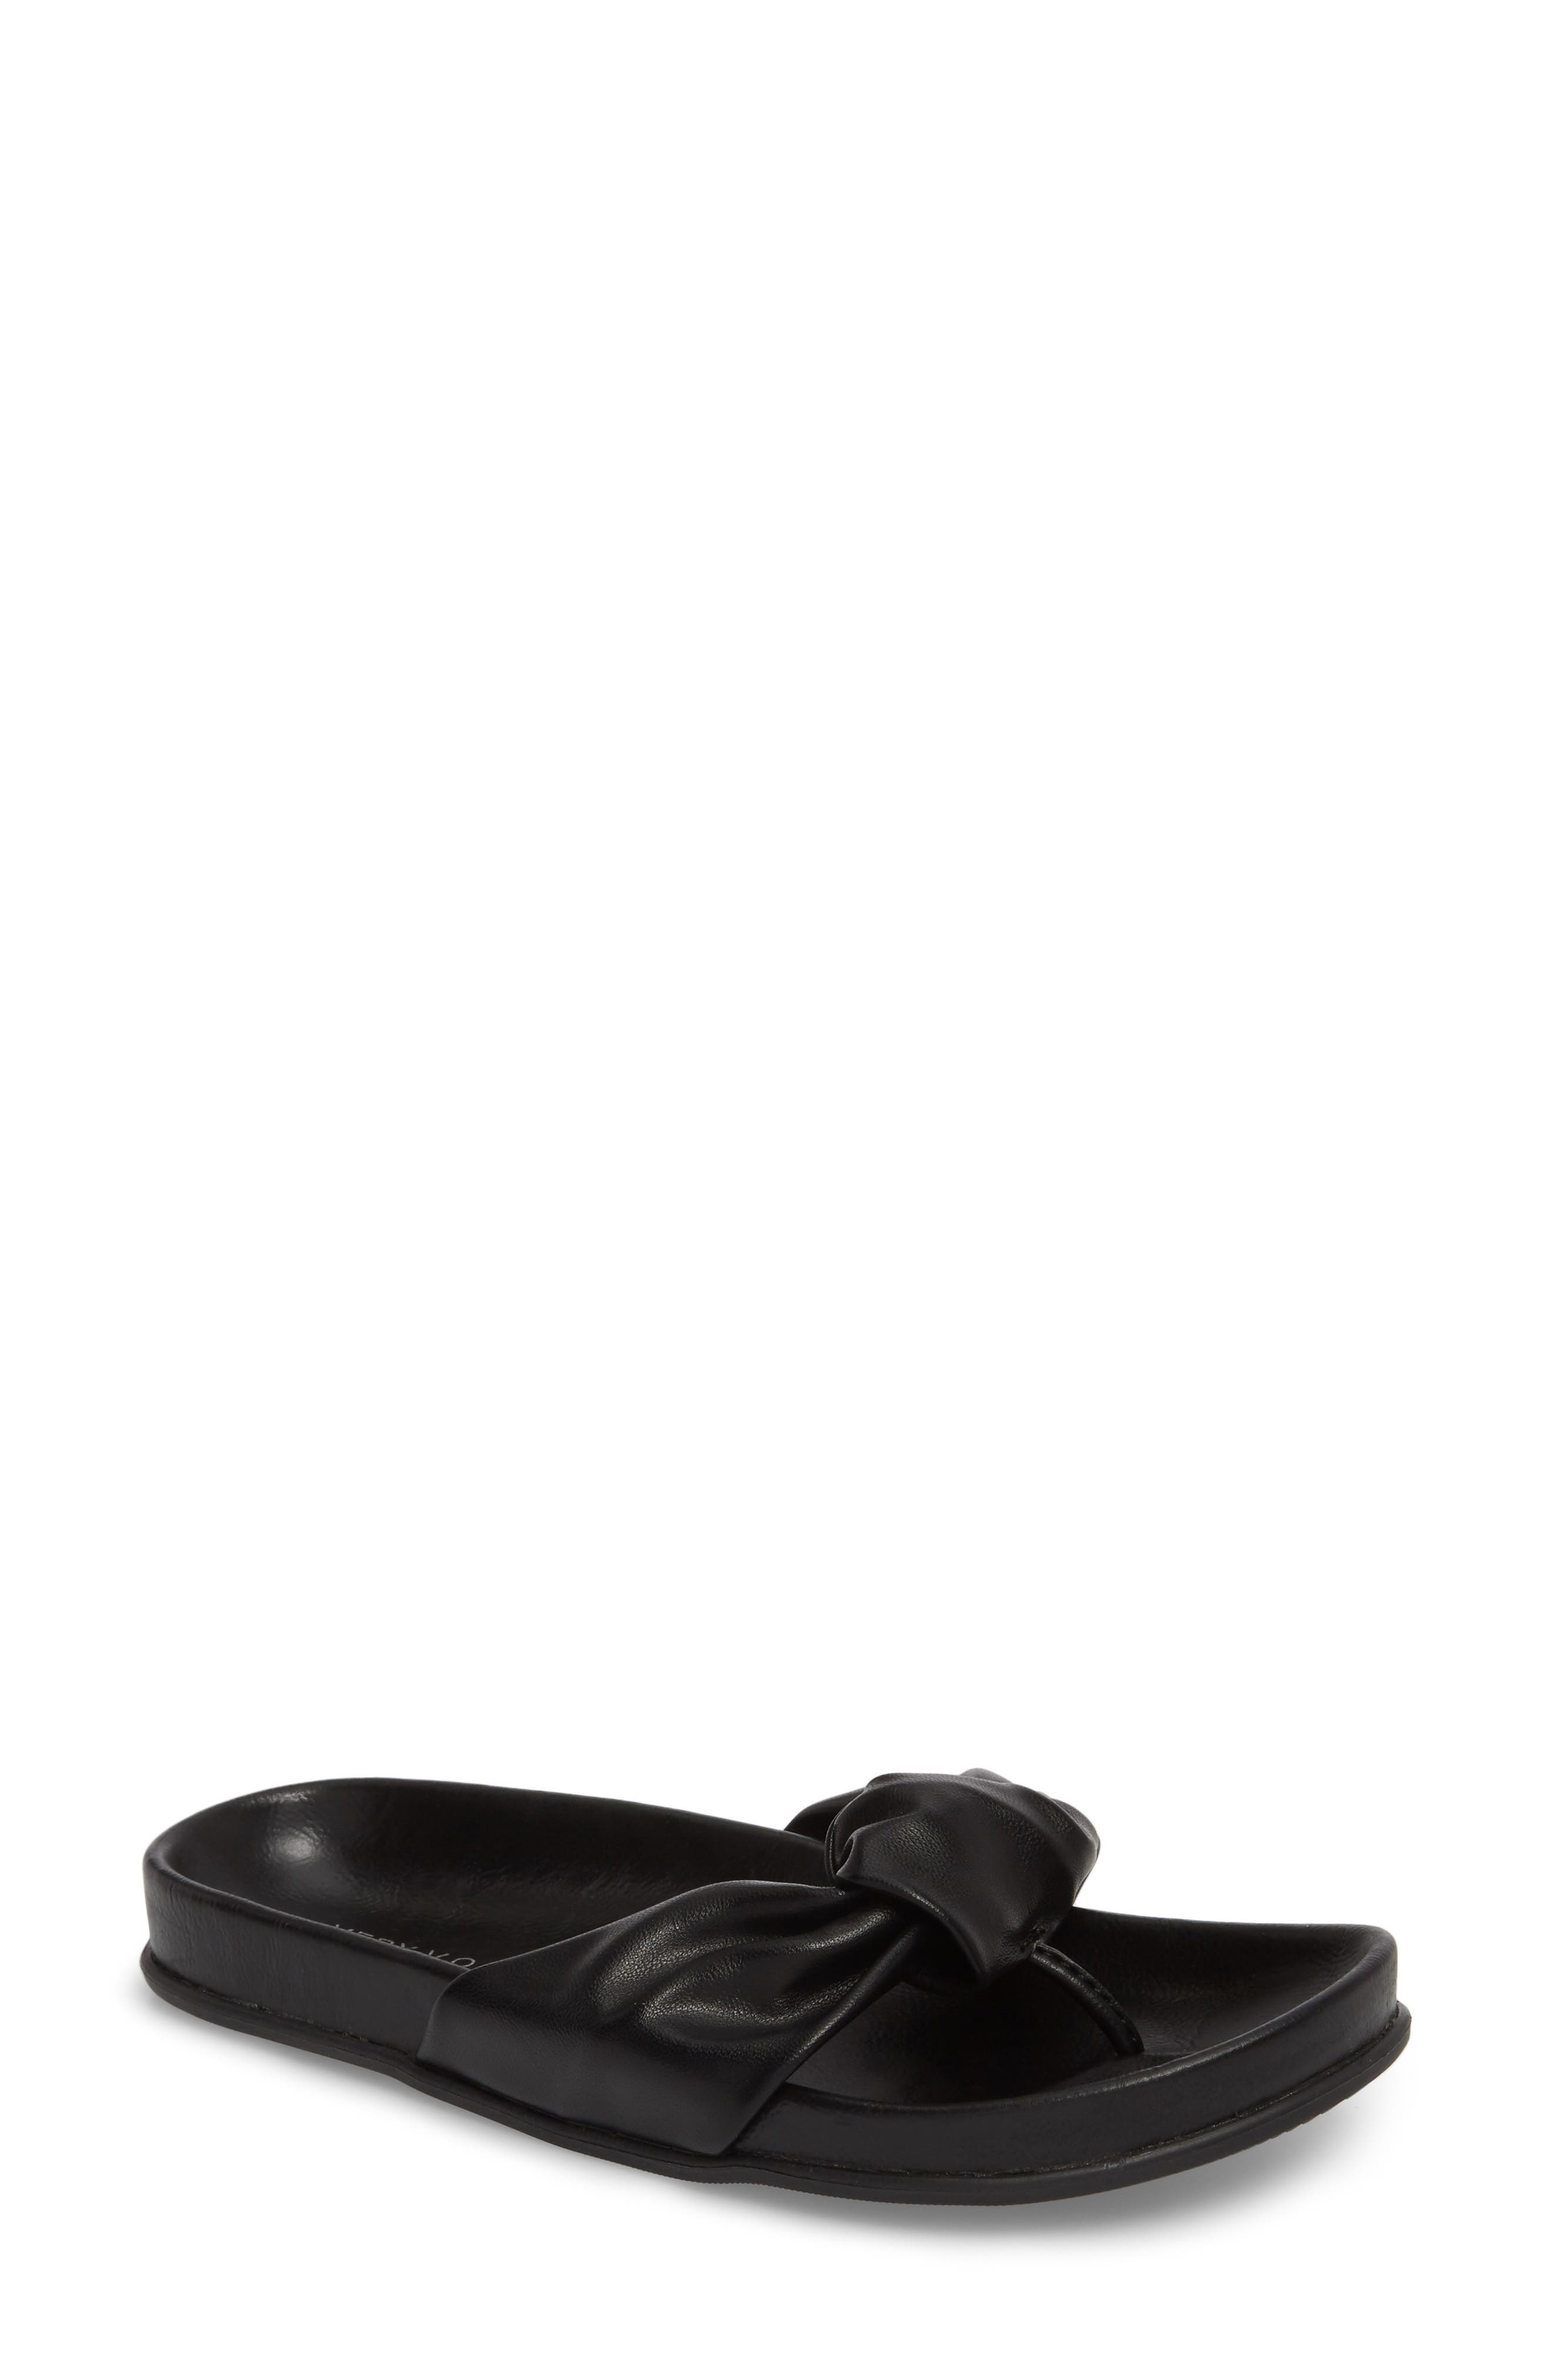 Glaze Bow Sandal,                         Main,                         color, Black